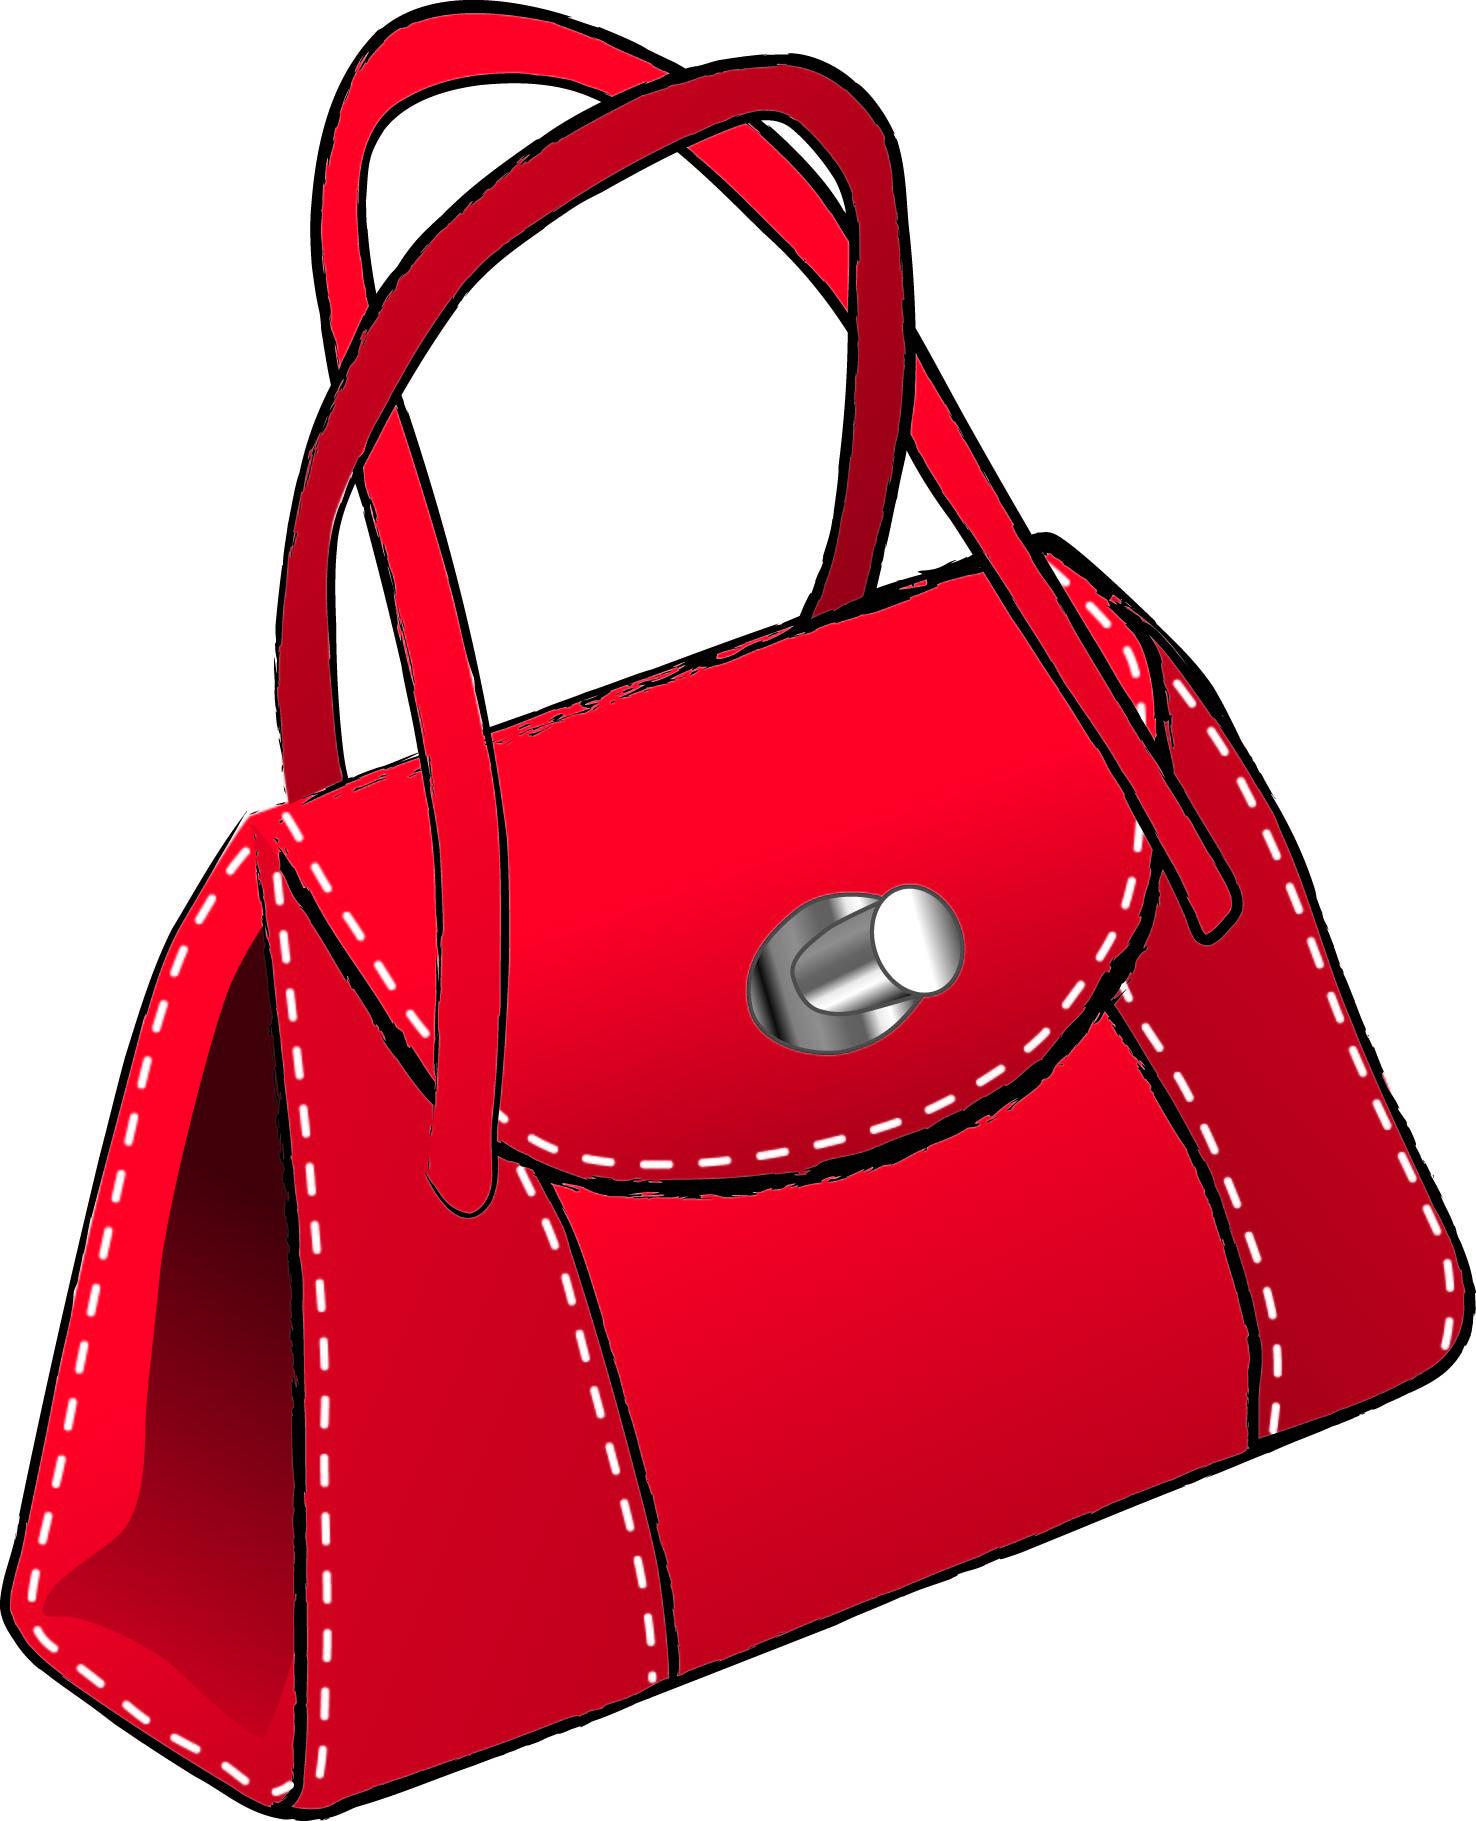 Purse clipart Purses image Handbag  of